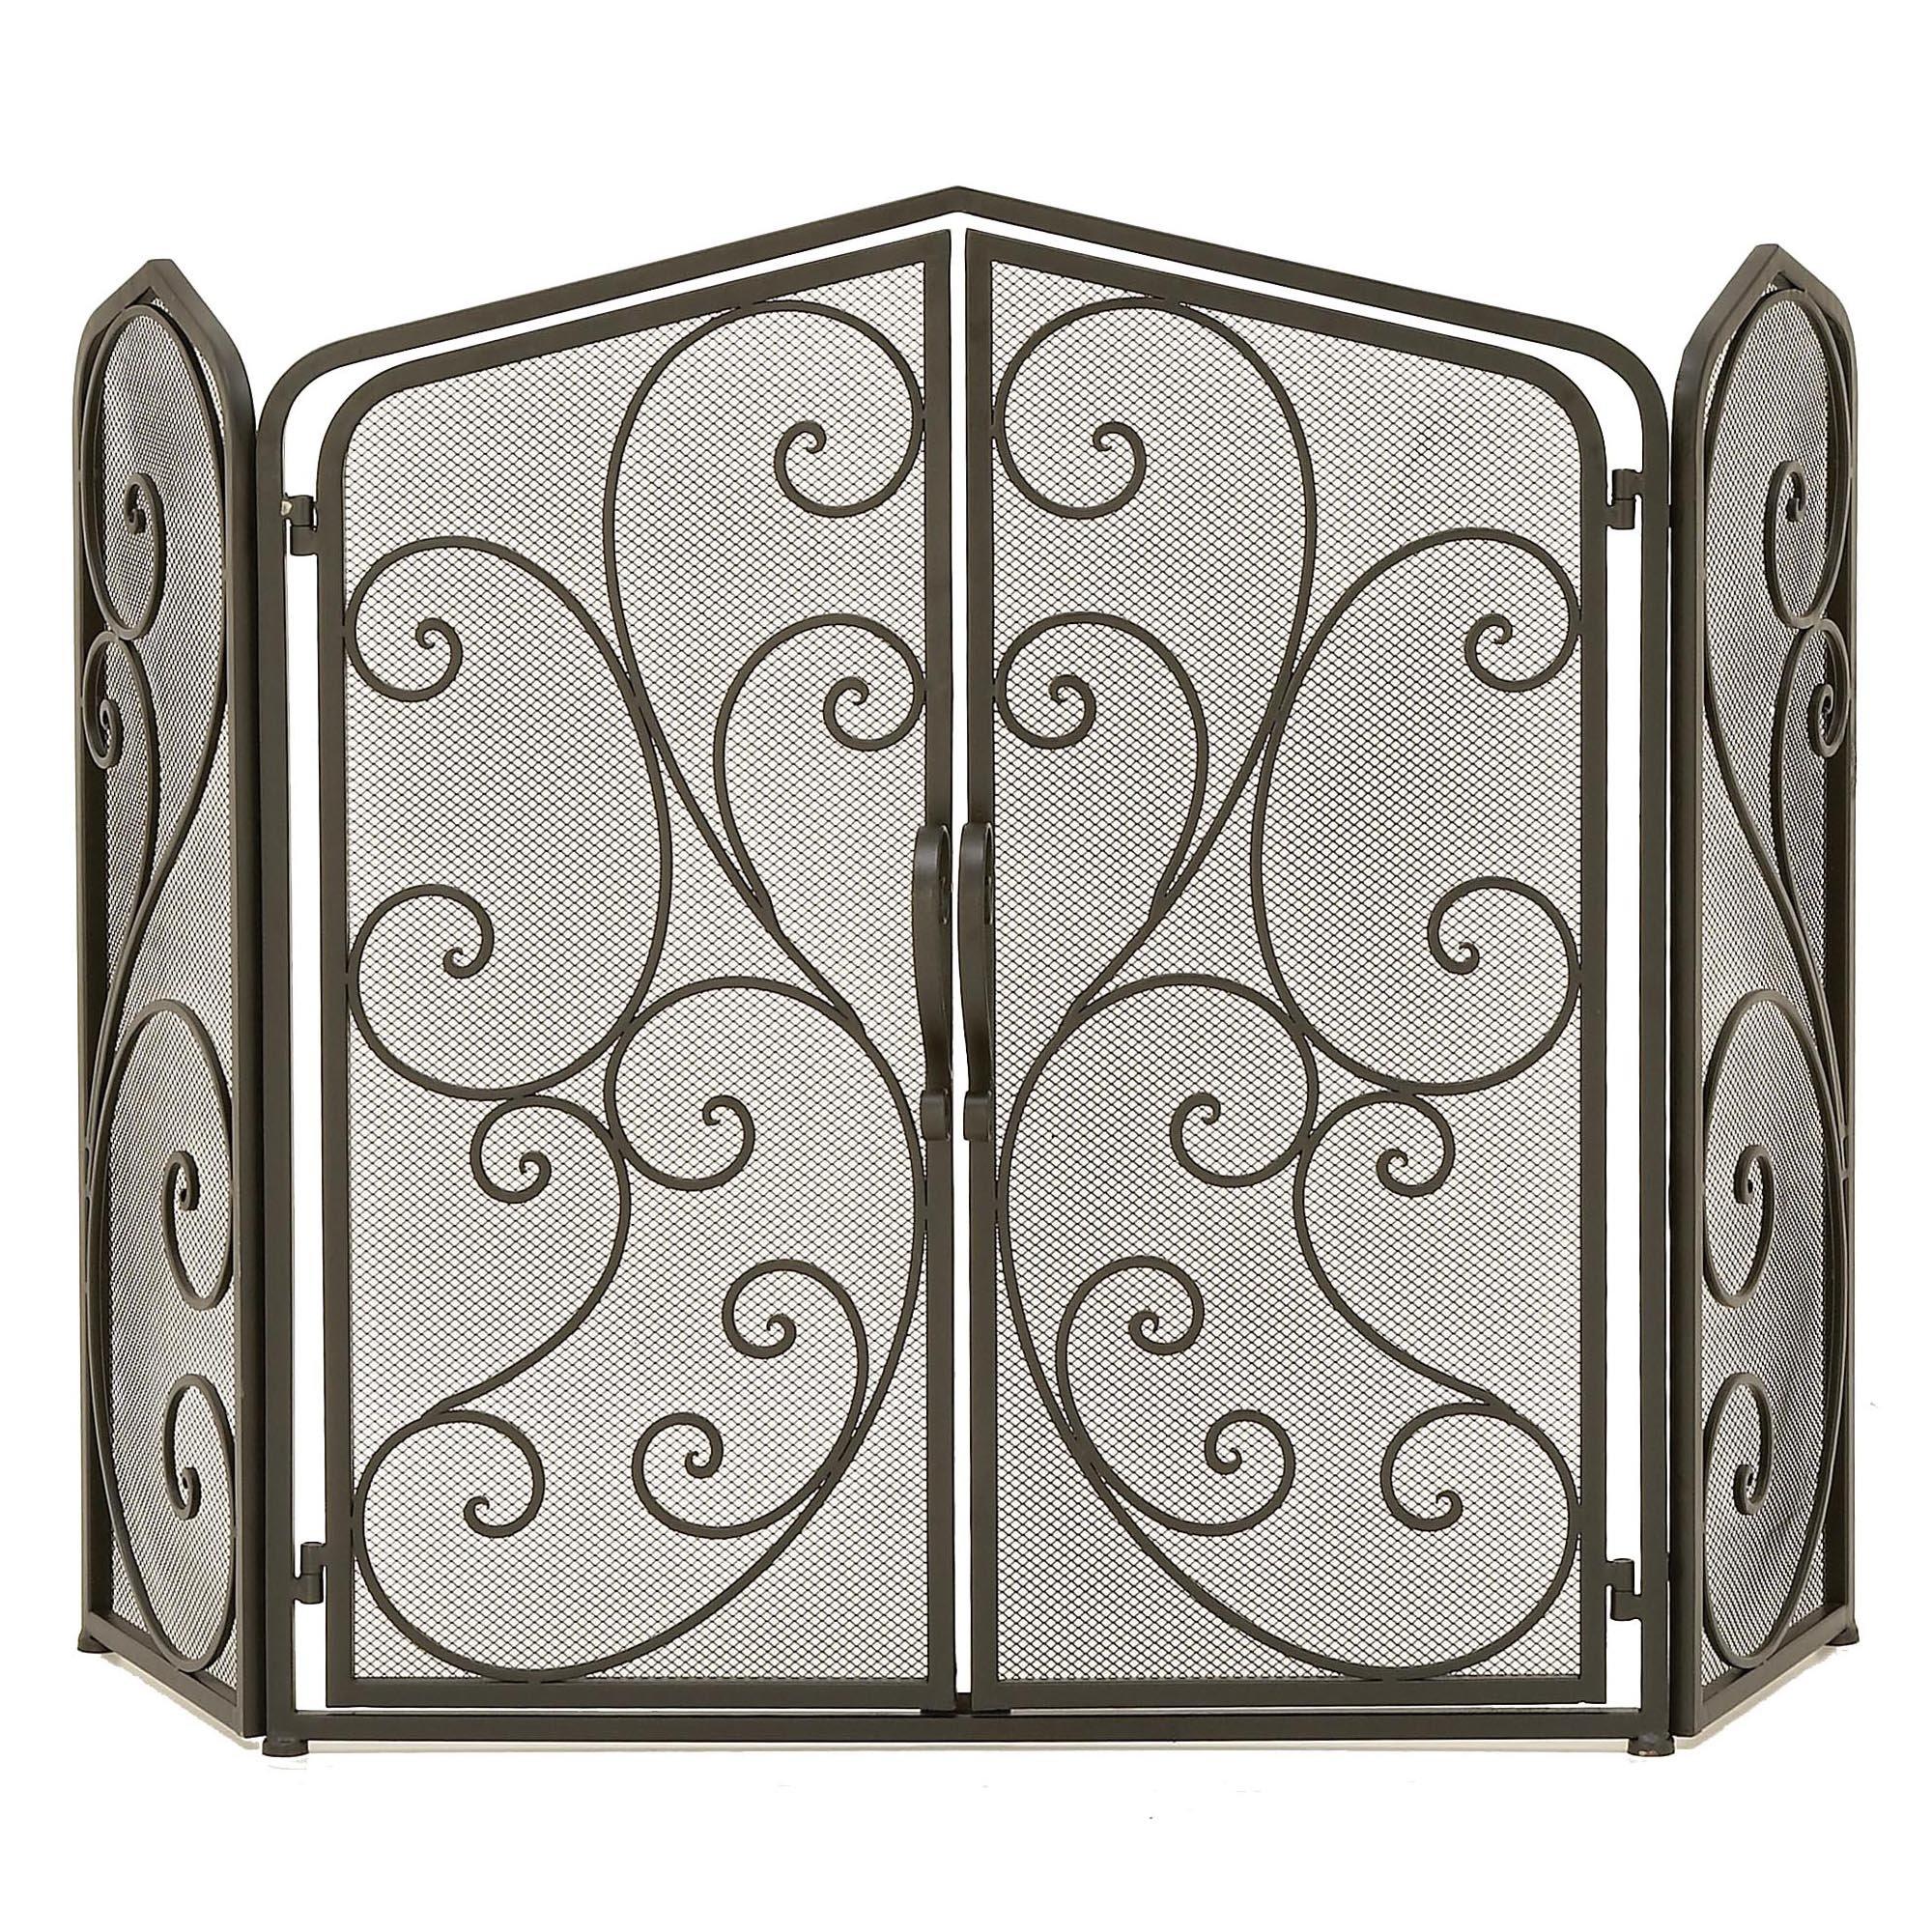 li wood mantelpieces fireplaces ny messina mantel screen made long island style custom fireplace curved